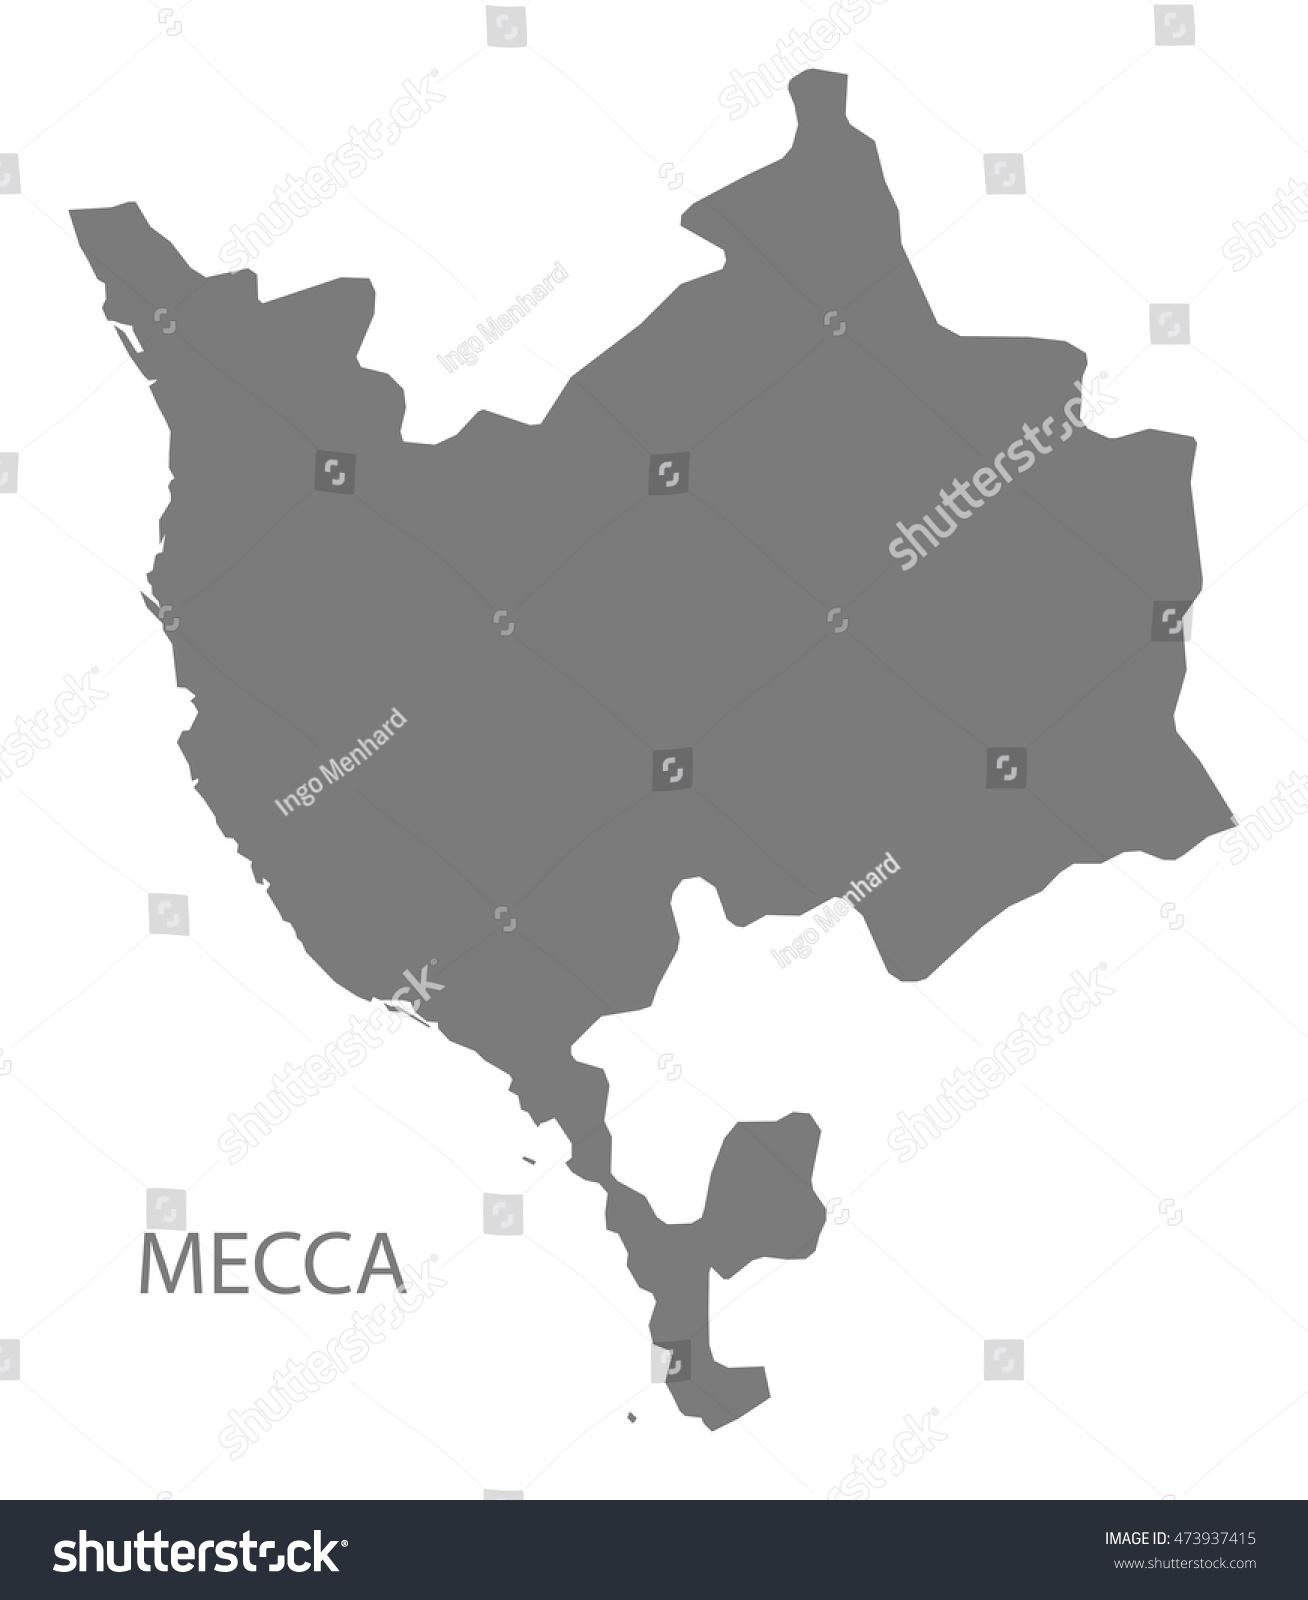 Mecca Saudi Arabia Map Grey Stock Vector 473937415 - Shutterstock